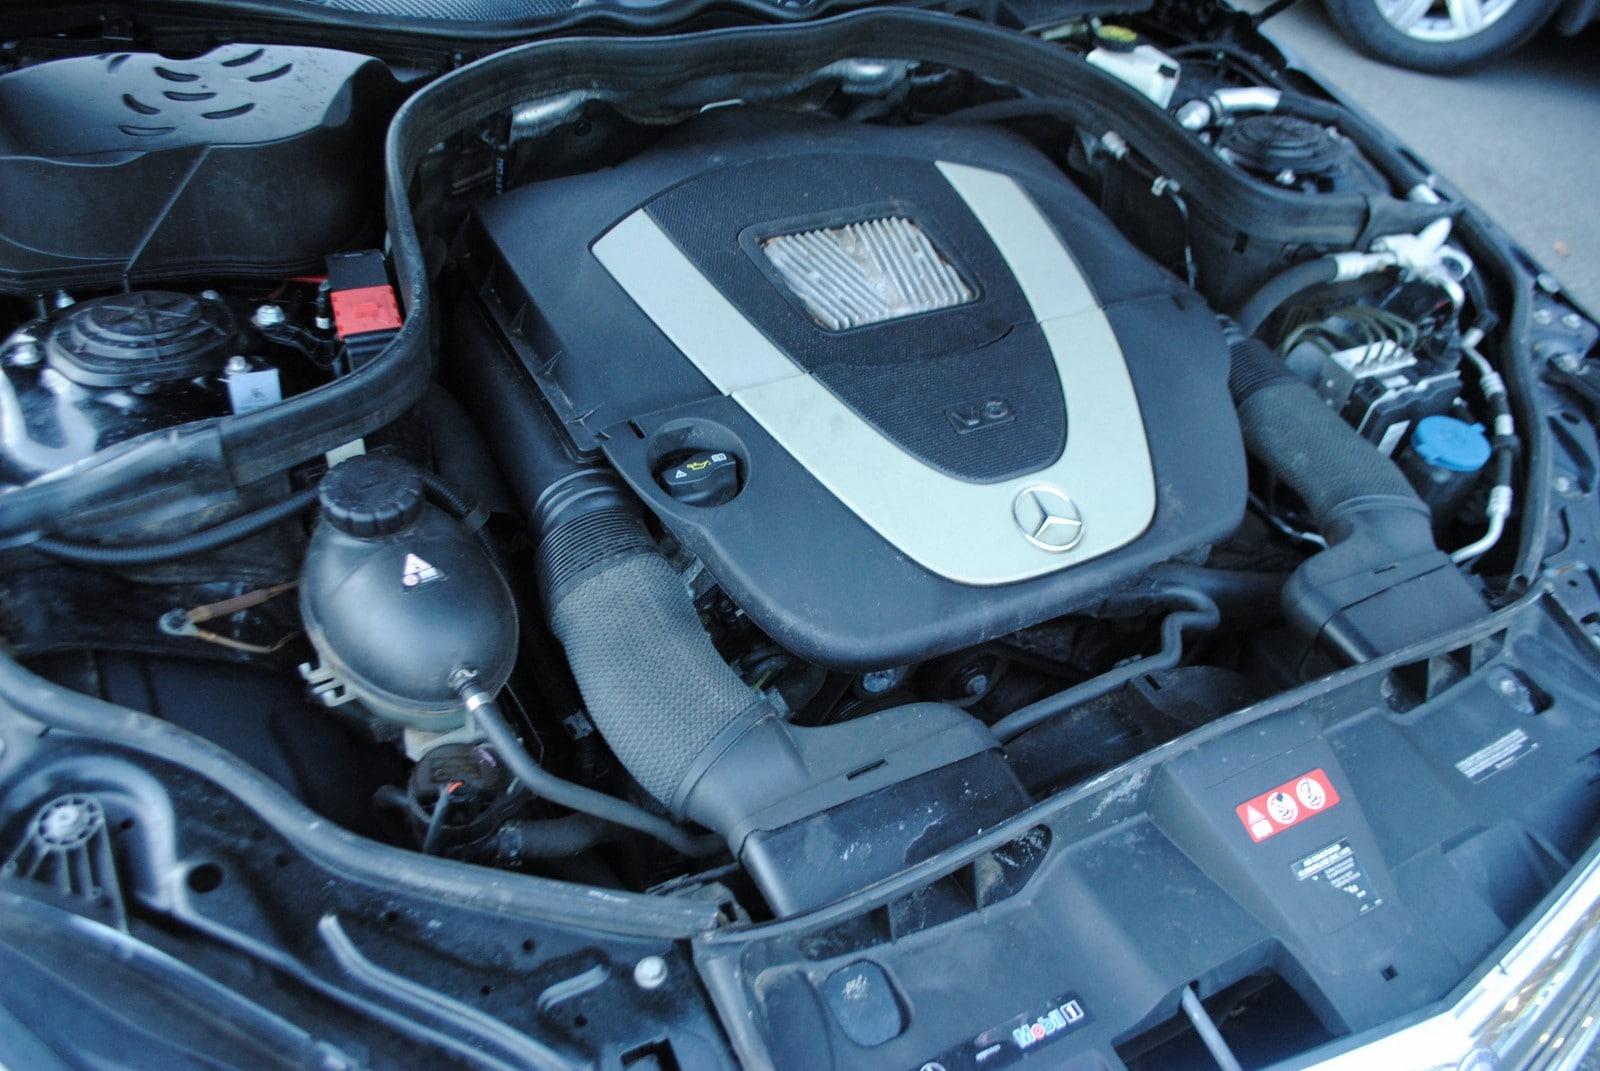 Mercedes Benz 2011 Omaha Pictures besides 2010 Mercedes Benz E Class 1e776c180a0e08f74a43648f070c07a0 also Mercedes Benz E Class Grey Metallic Media furthermore 6 further Mercedes Benz E Class Blue Metallic Washington. on mercedes benz e350w4